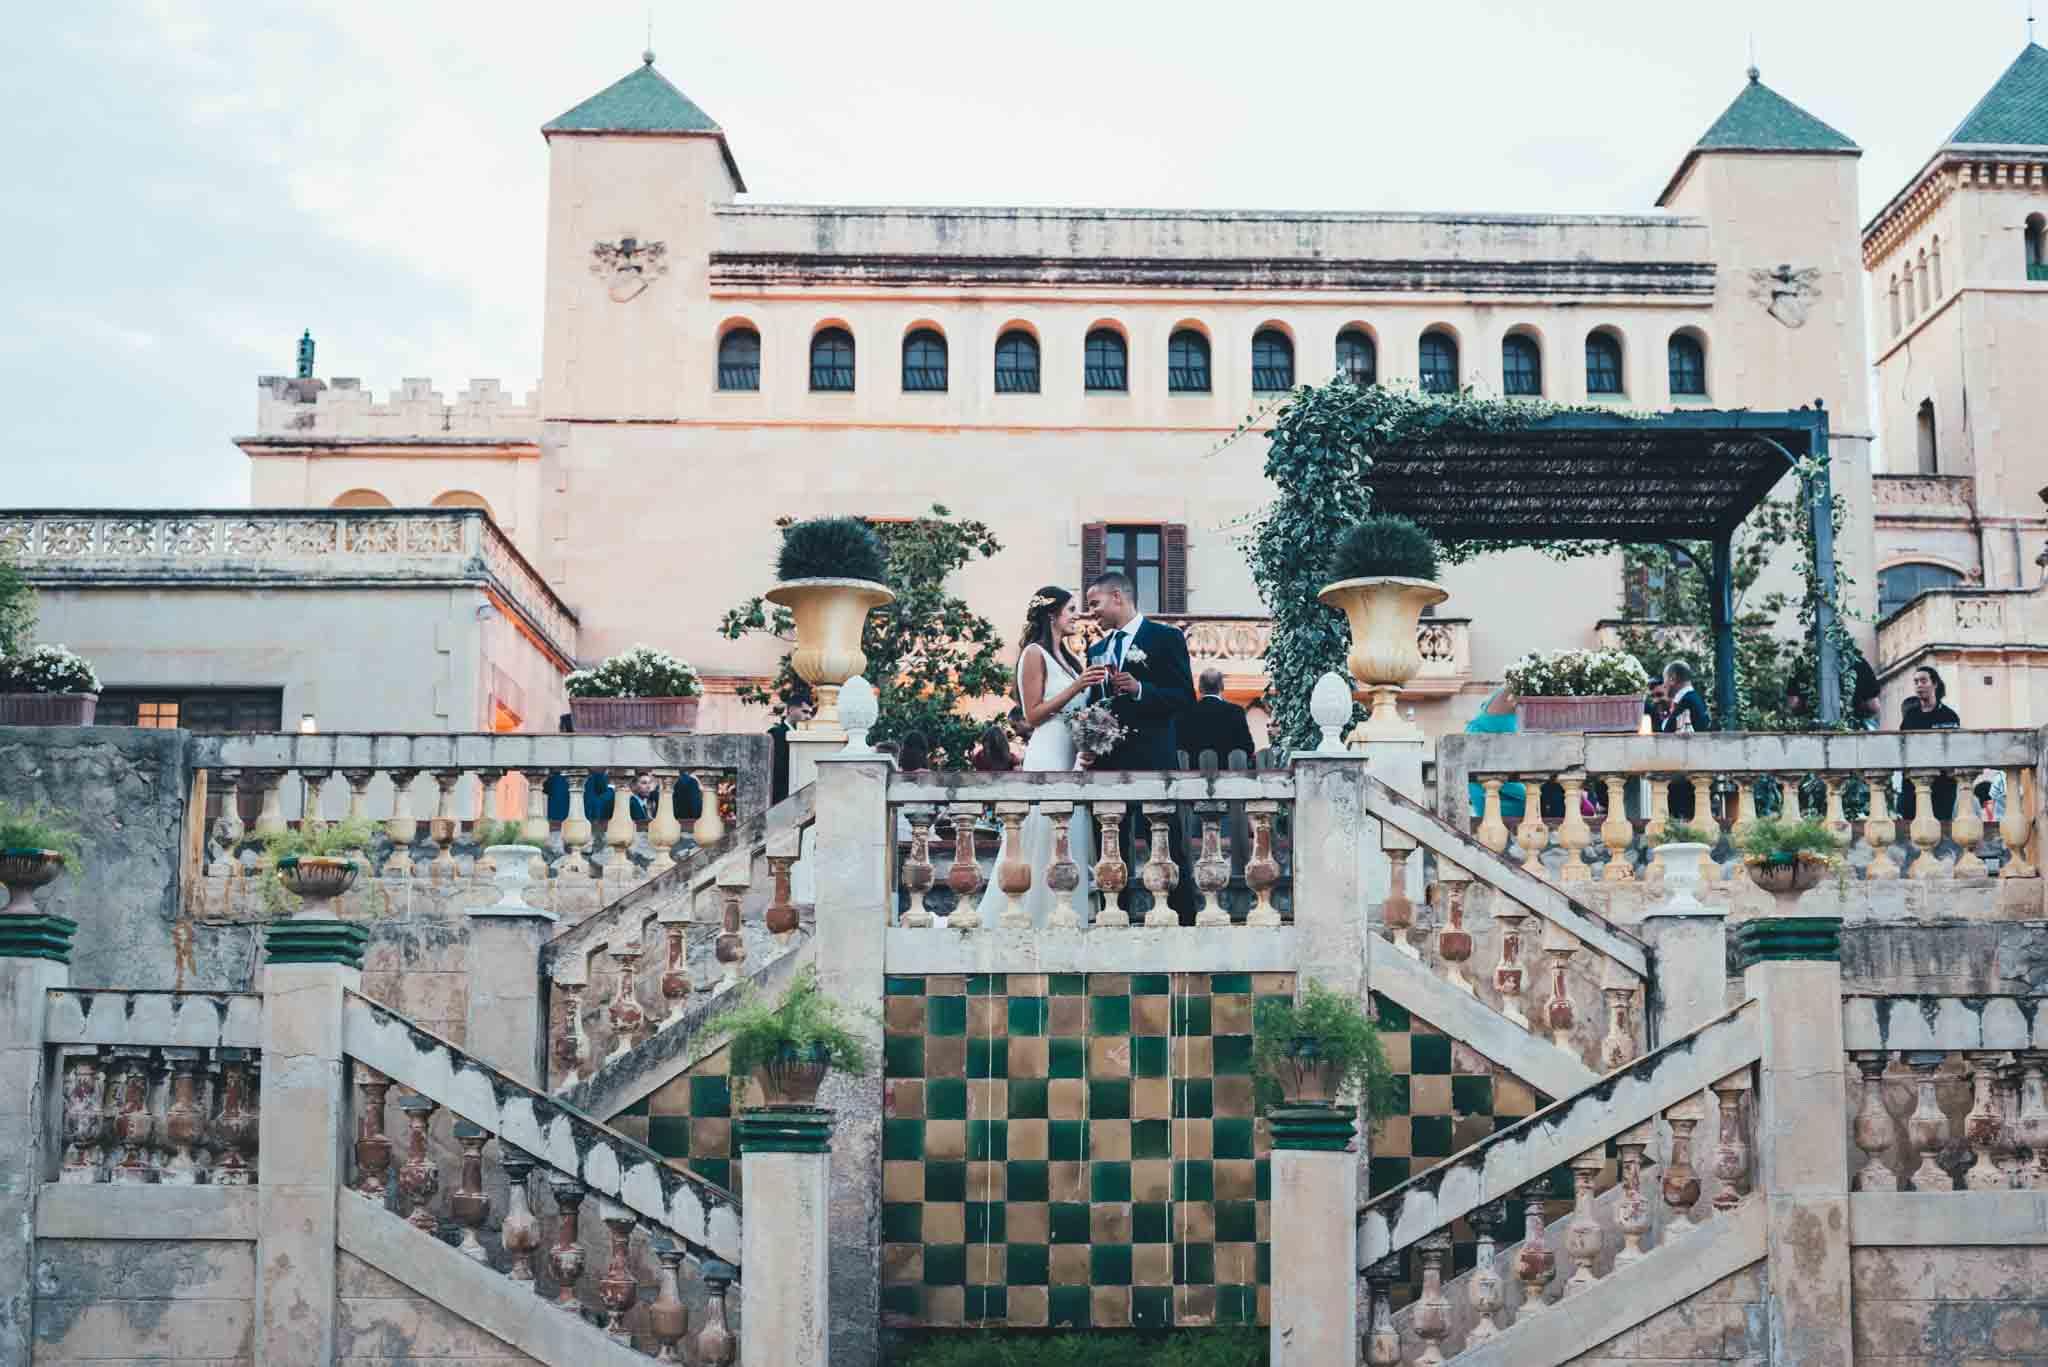 Boda-Heretat-Sabartes-Tarragona-Fotografía-Laura-Arroyo-DSC_9228